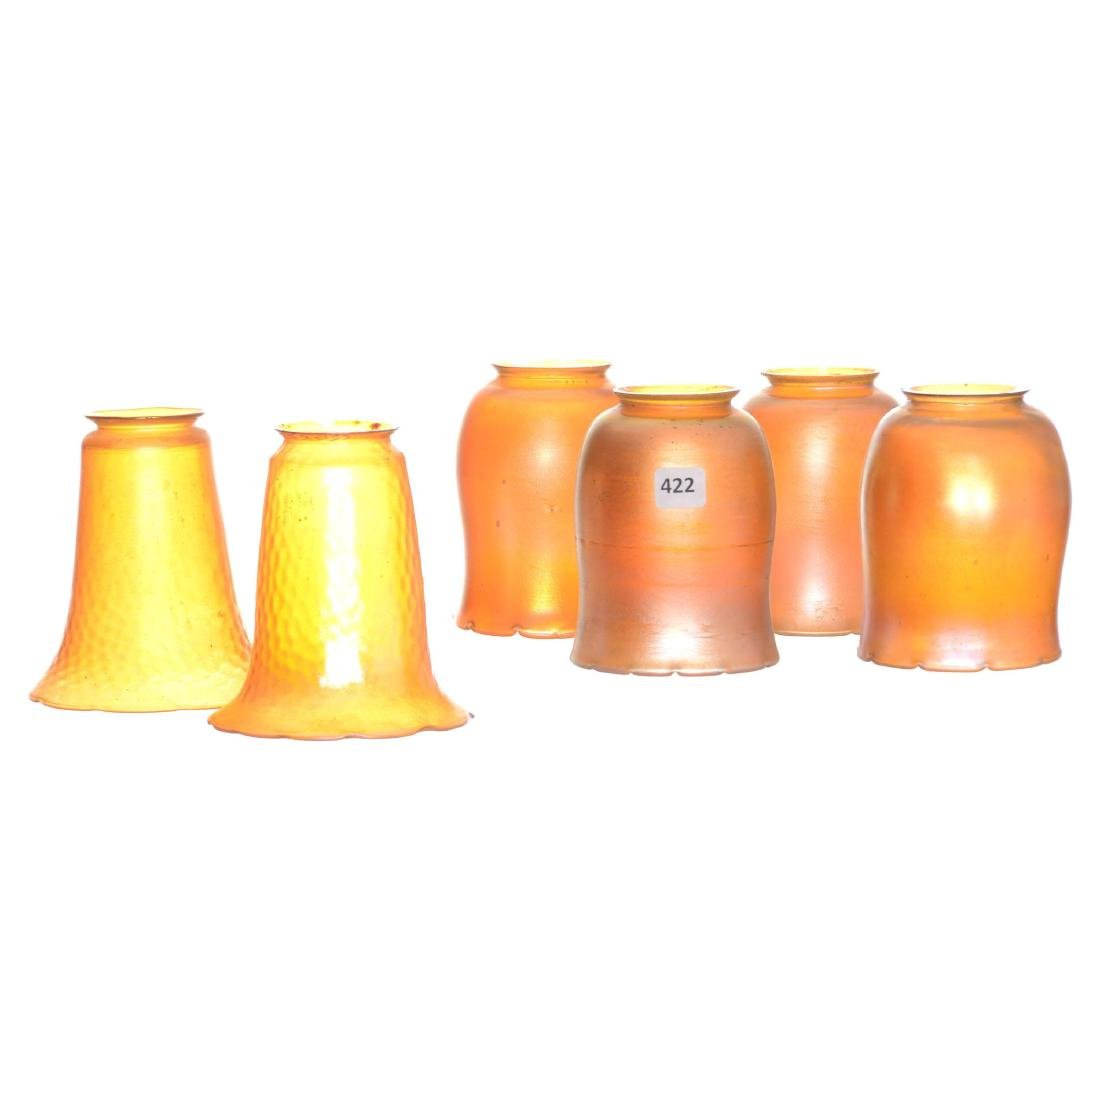 (6) Art Glass Lamp Shades